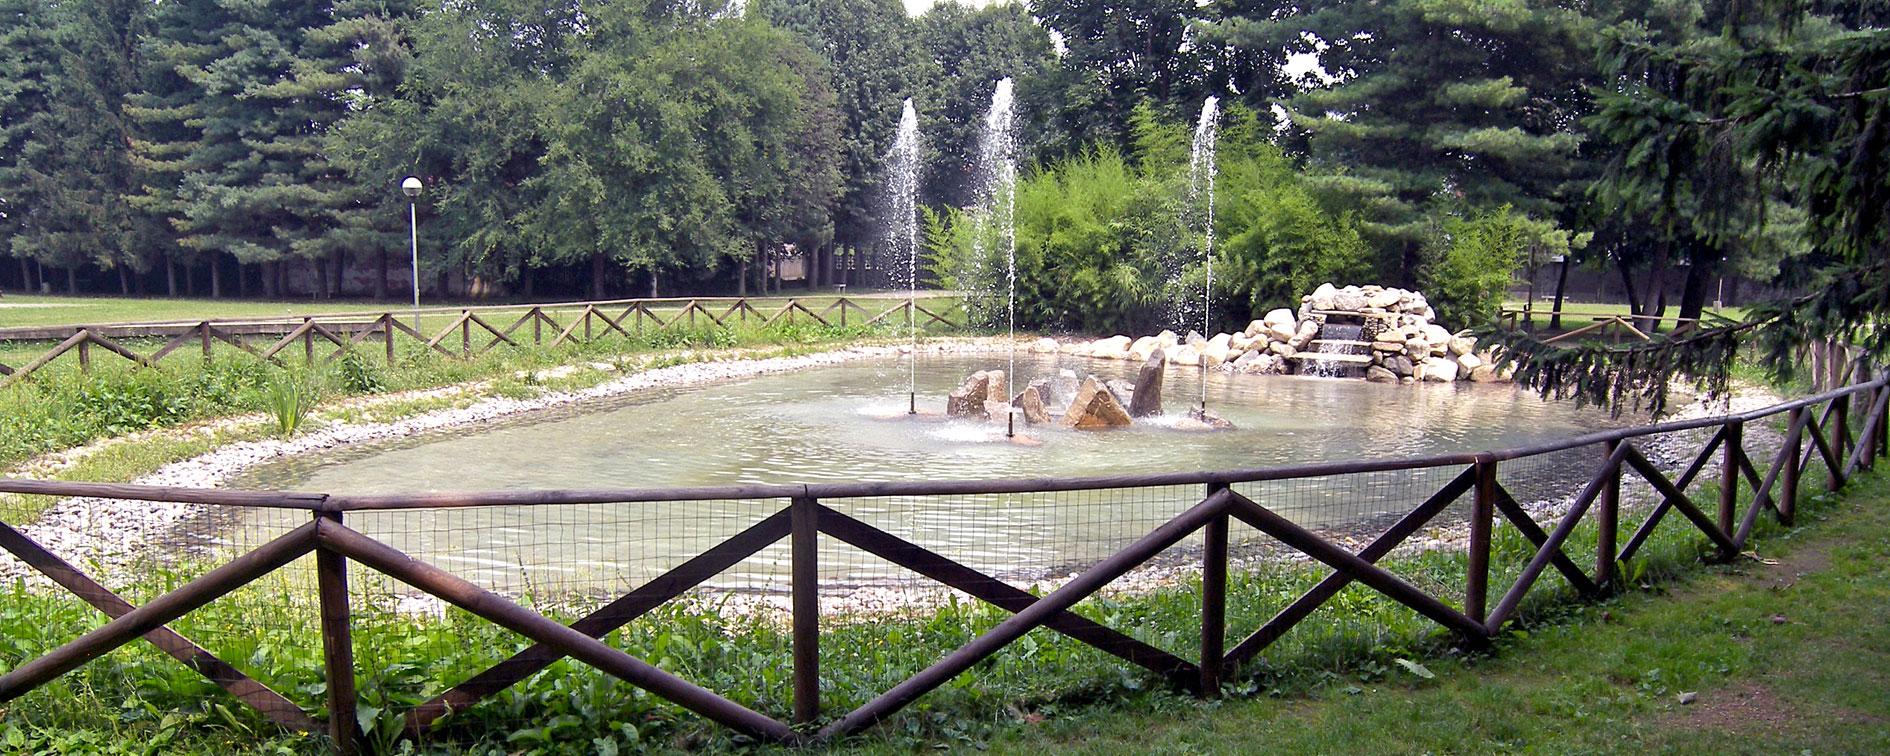 Irriflor piscine giardini ed aree benessere for Laghetti nei giardini